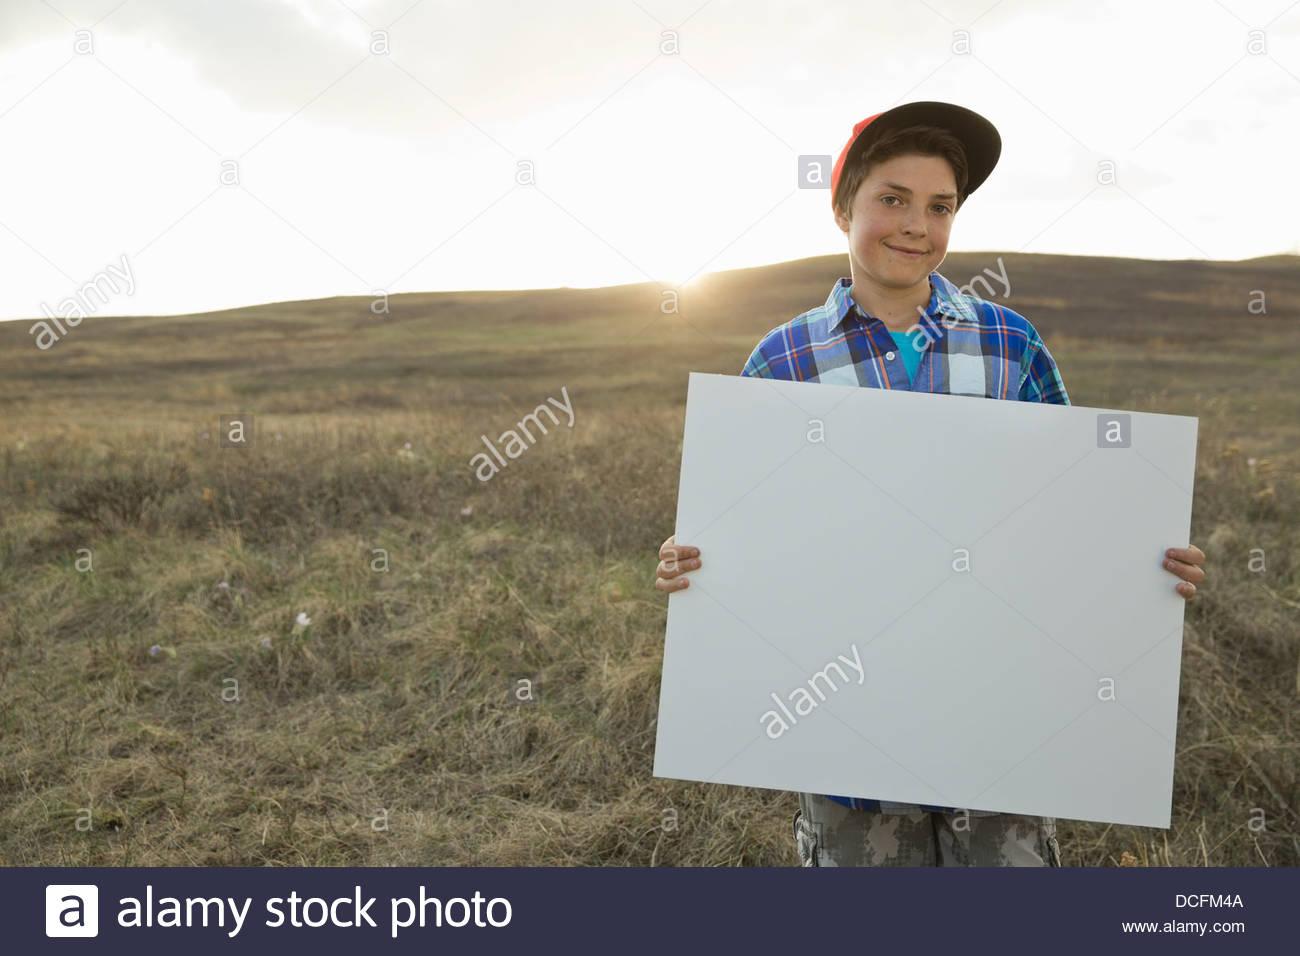 Boy standing on hillside holding blank sign board - Stock Image